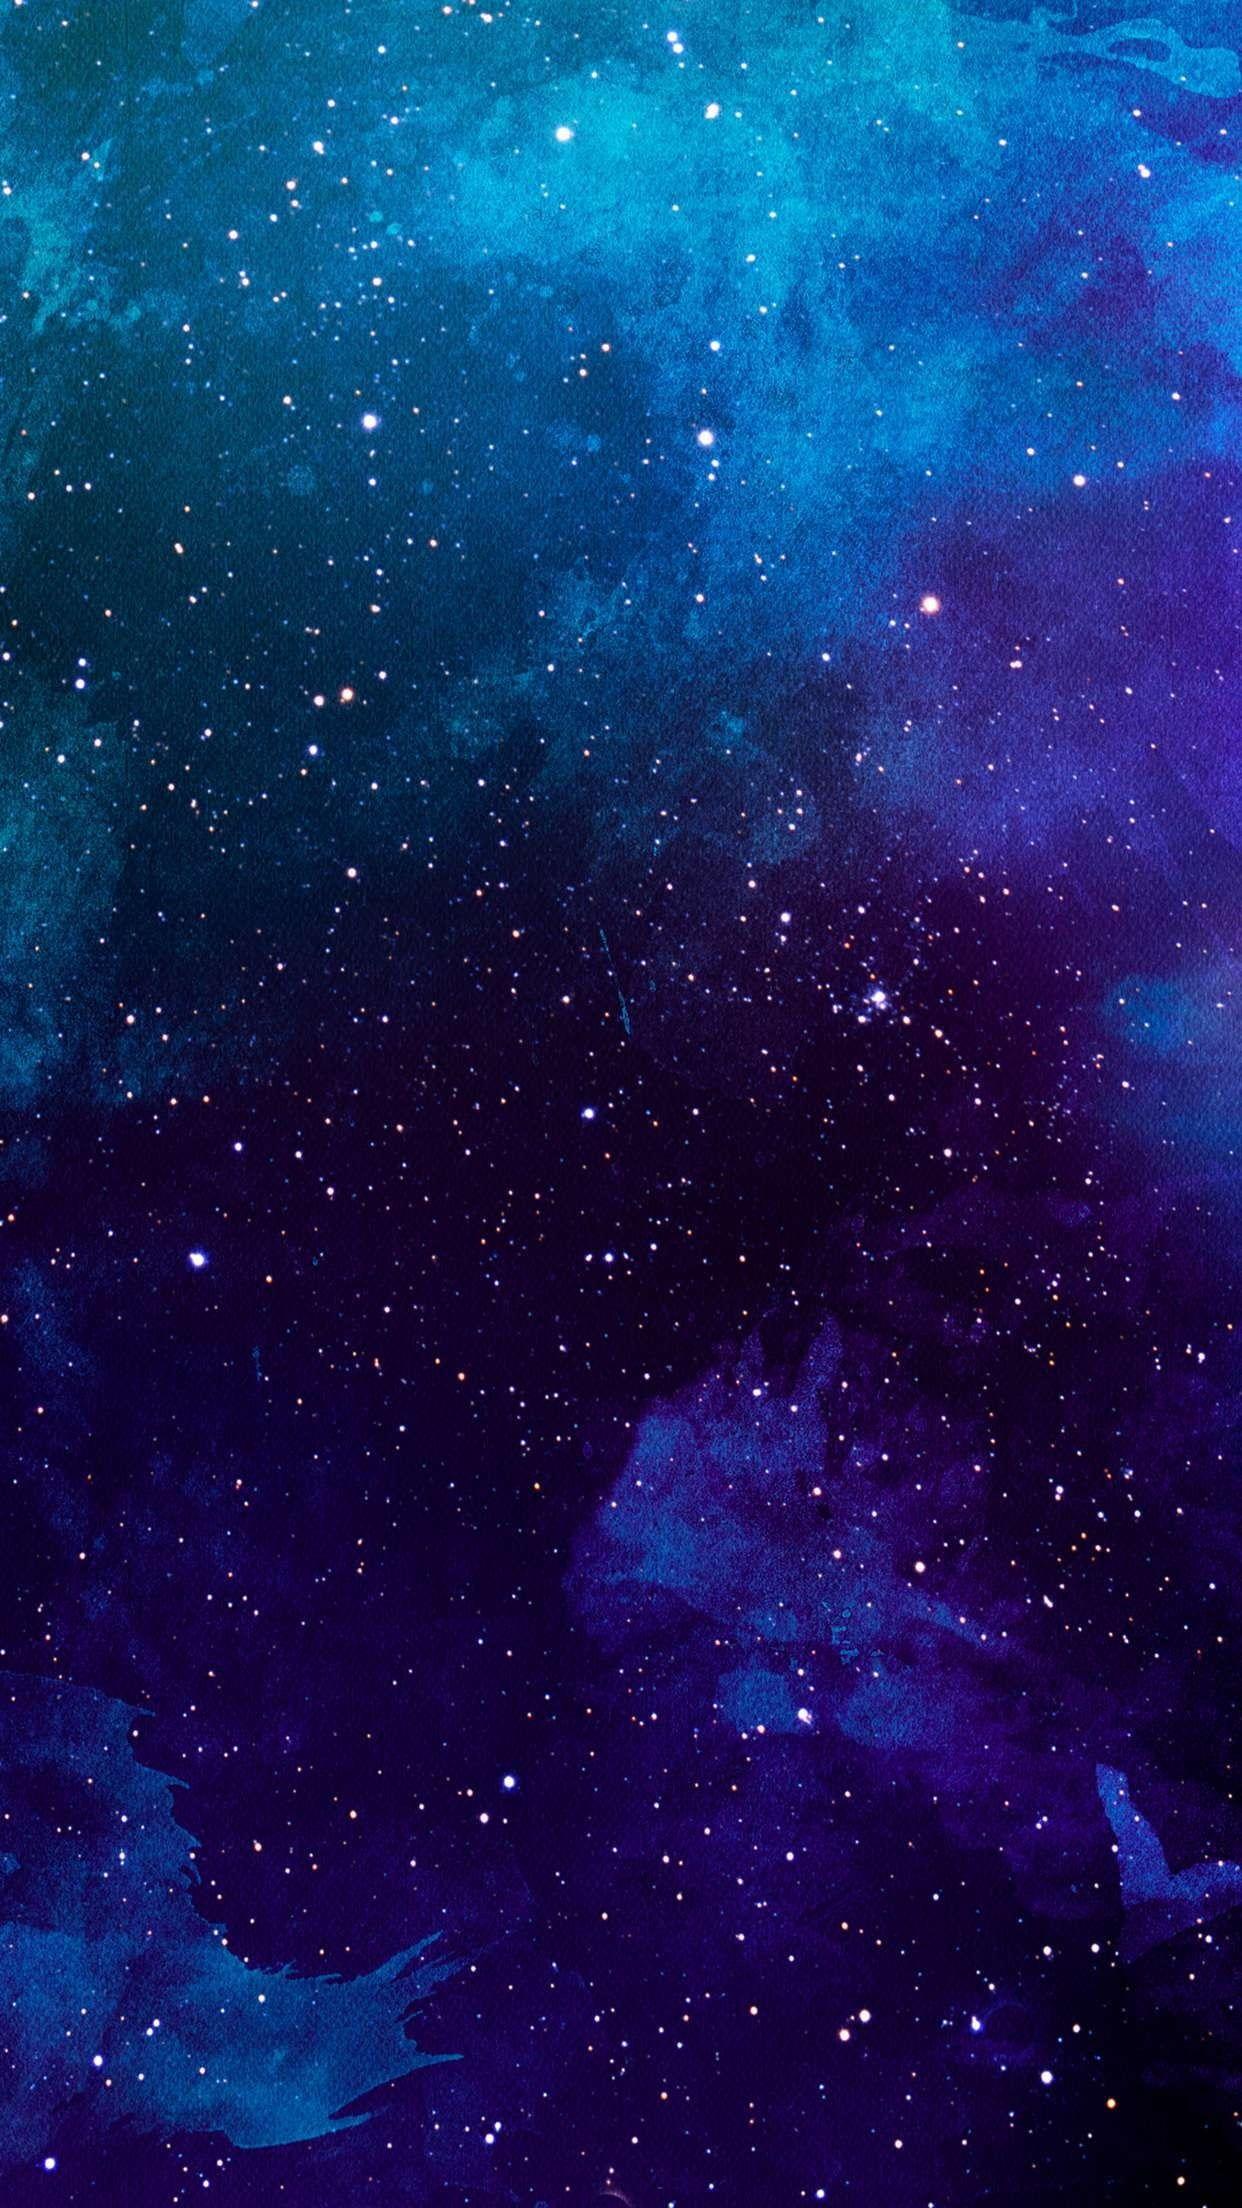 Purple And Blue Galaxy Illustration Digital Art Colorful 1080p Wallpaper Hdwallpaper Deskt Purple Galaxy Wallpaper Purple Wallpaper Iphone Wallpaper Space